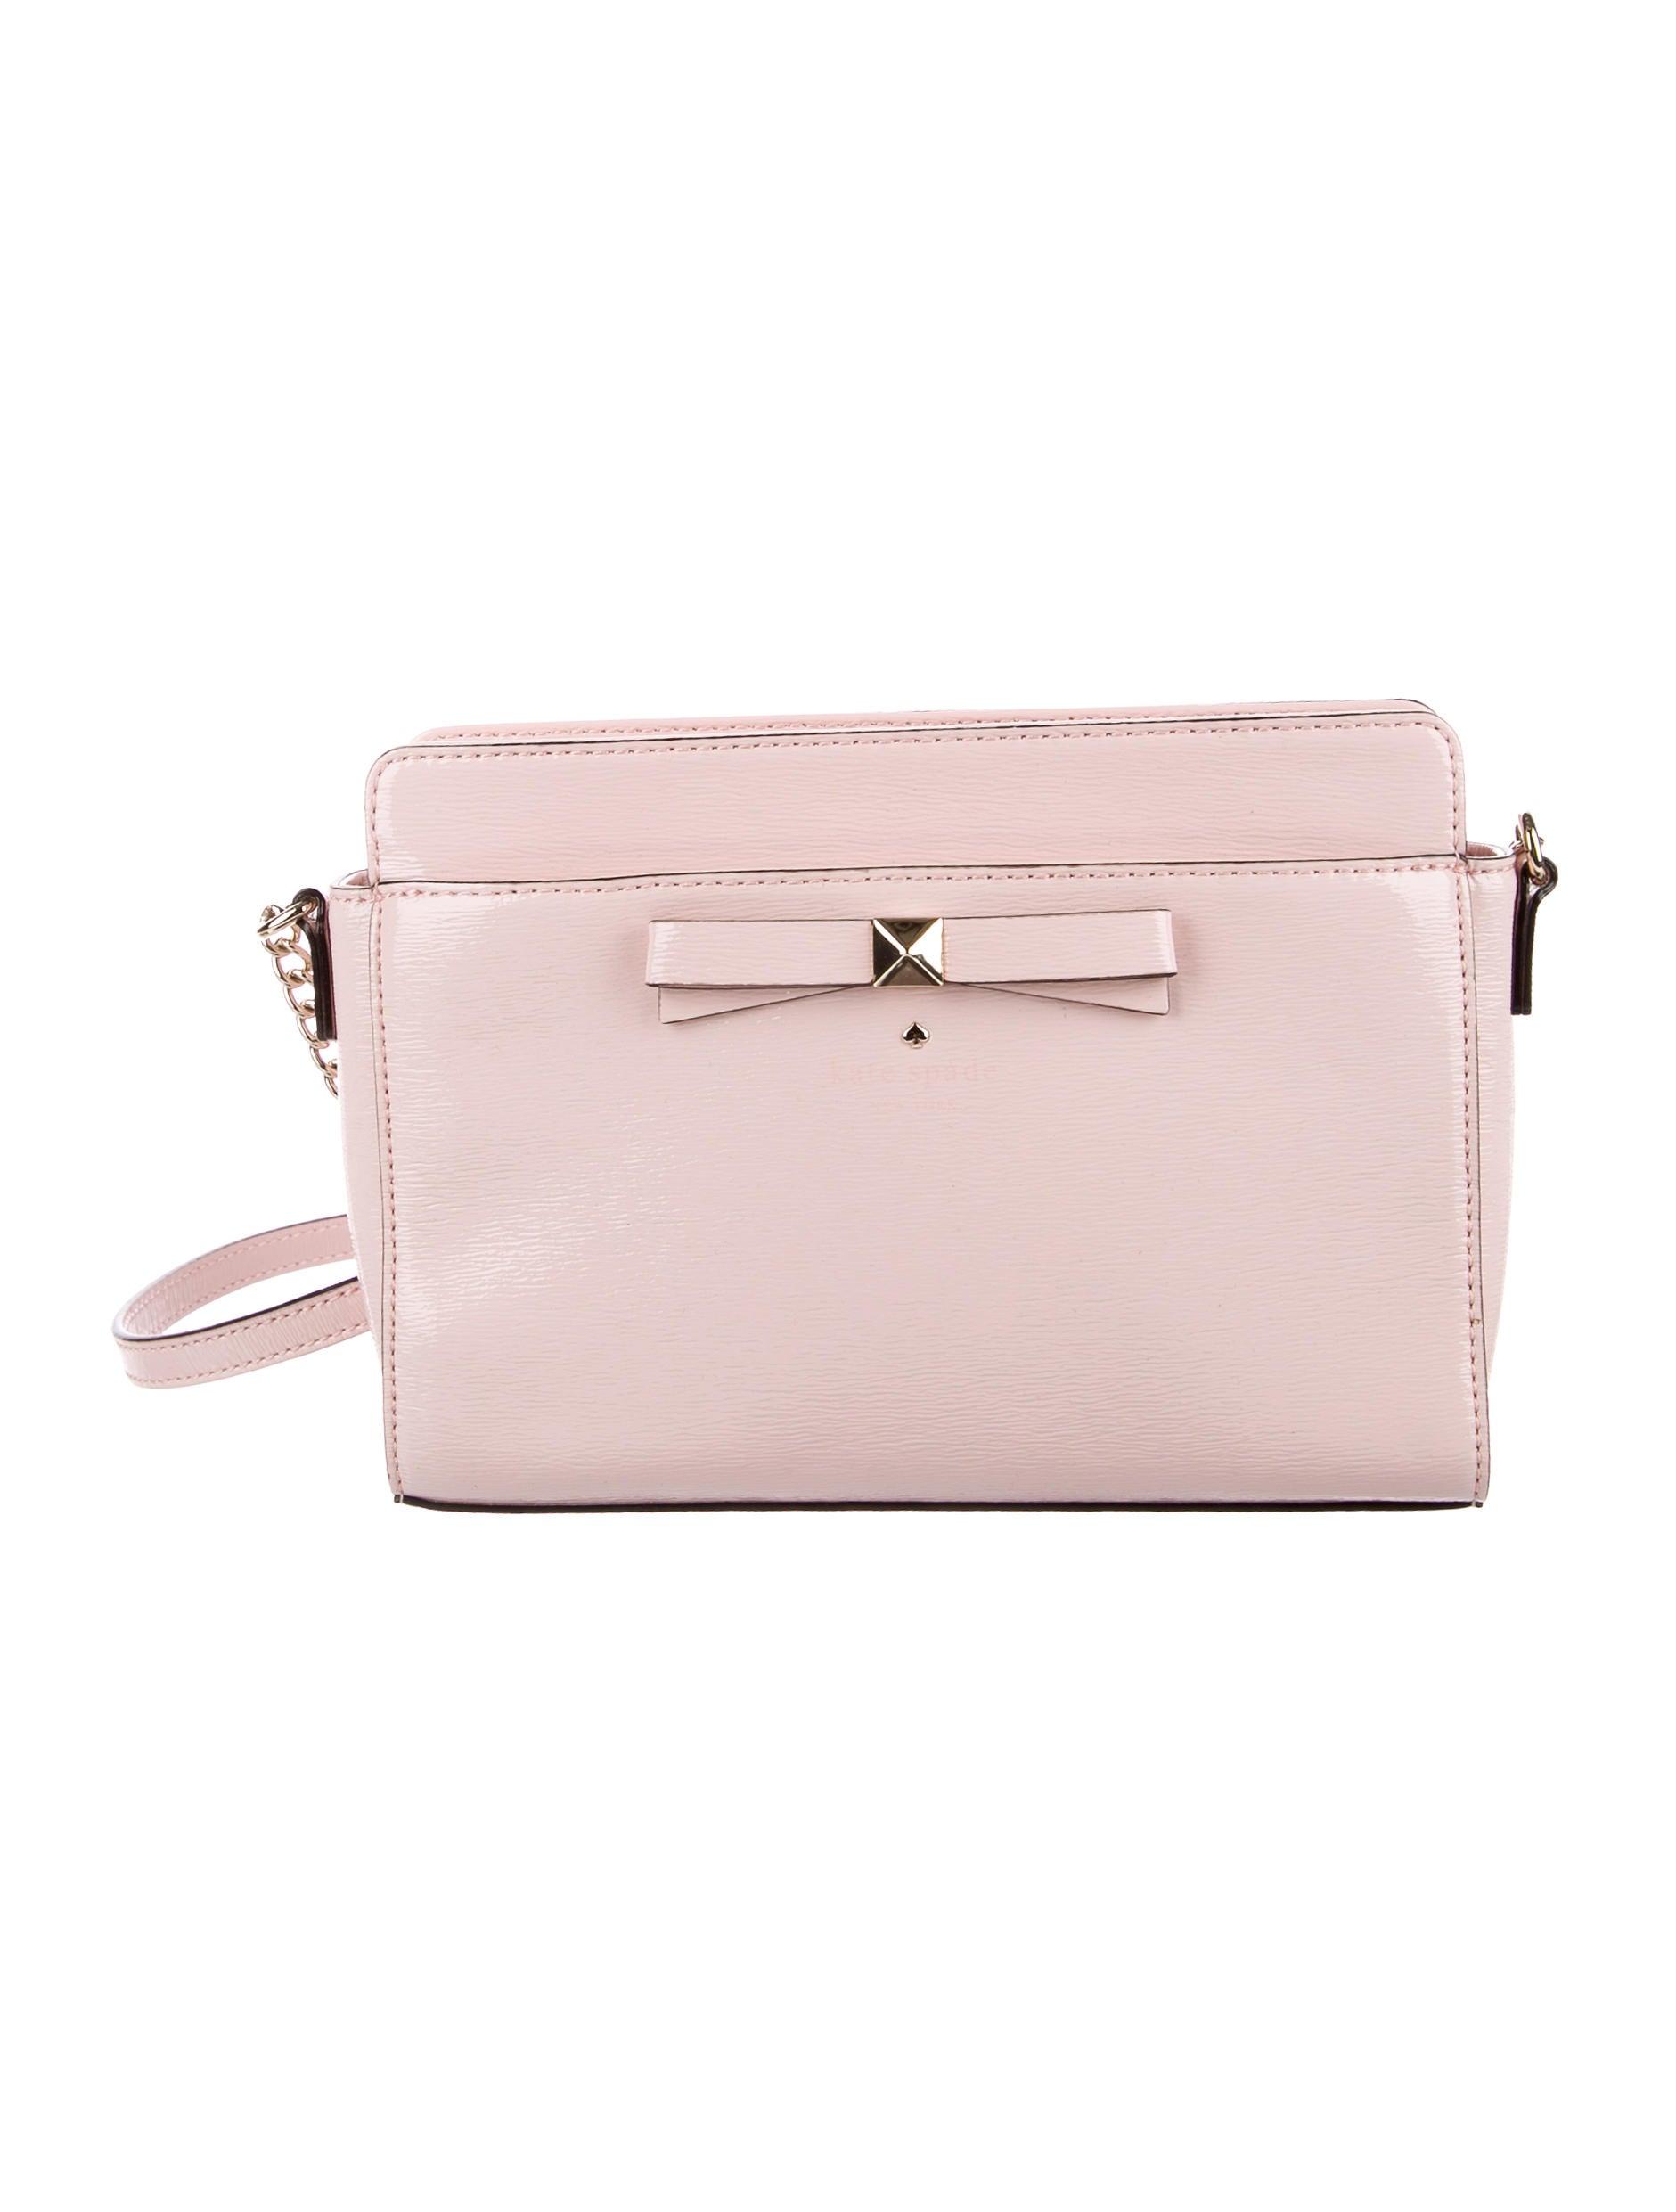 2daf88155f19 Kate Spade New York Beacon Court Angelina Crossbody Bag - Handbags ...